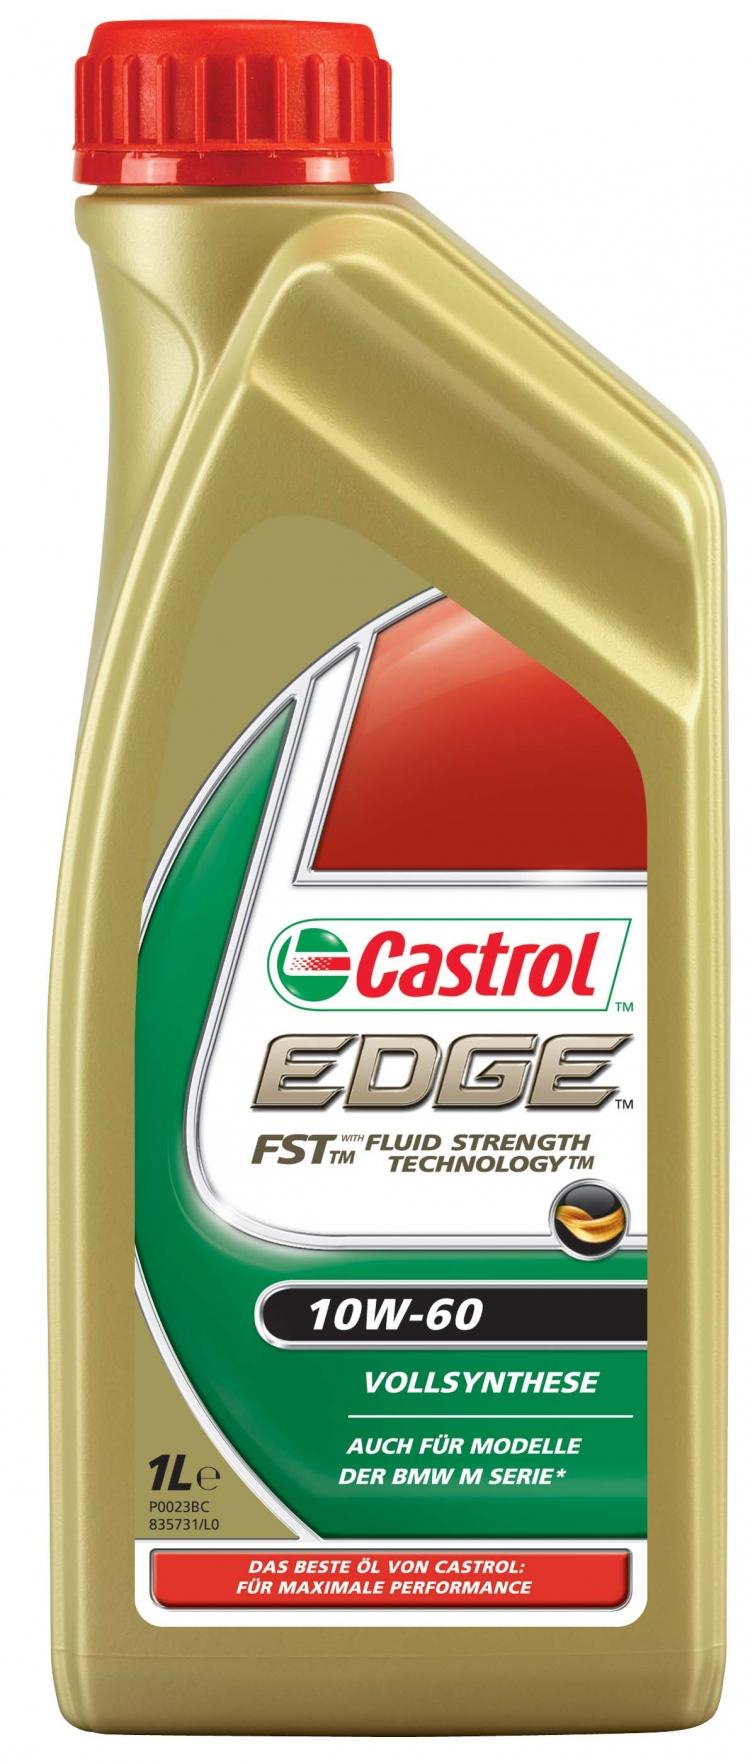 Full synthetic oil in a fresh build CB450 K0 engine from mile 0 ?-castrol-edge-10w60-edge-fst.jpg